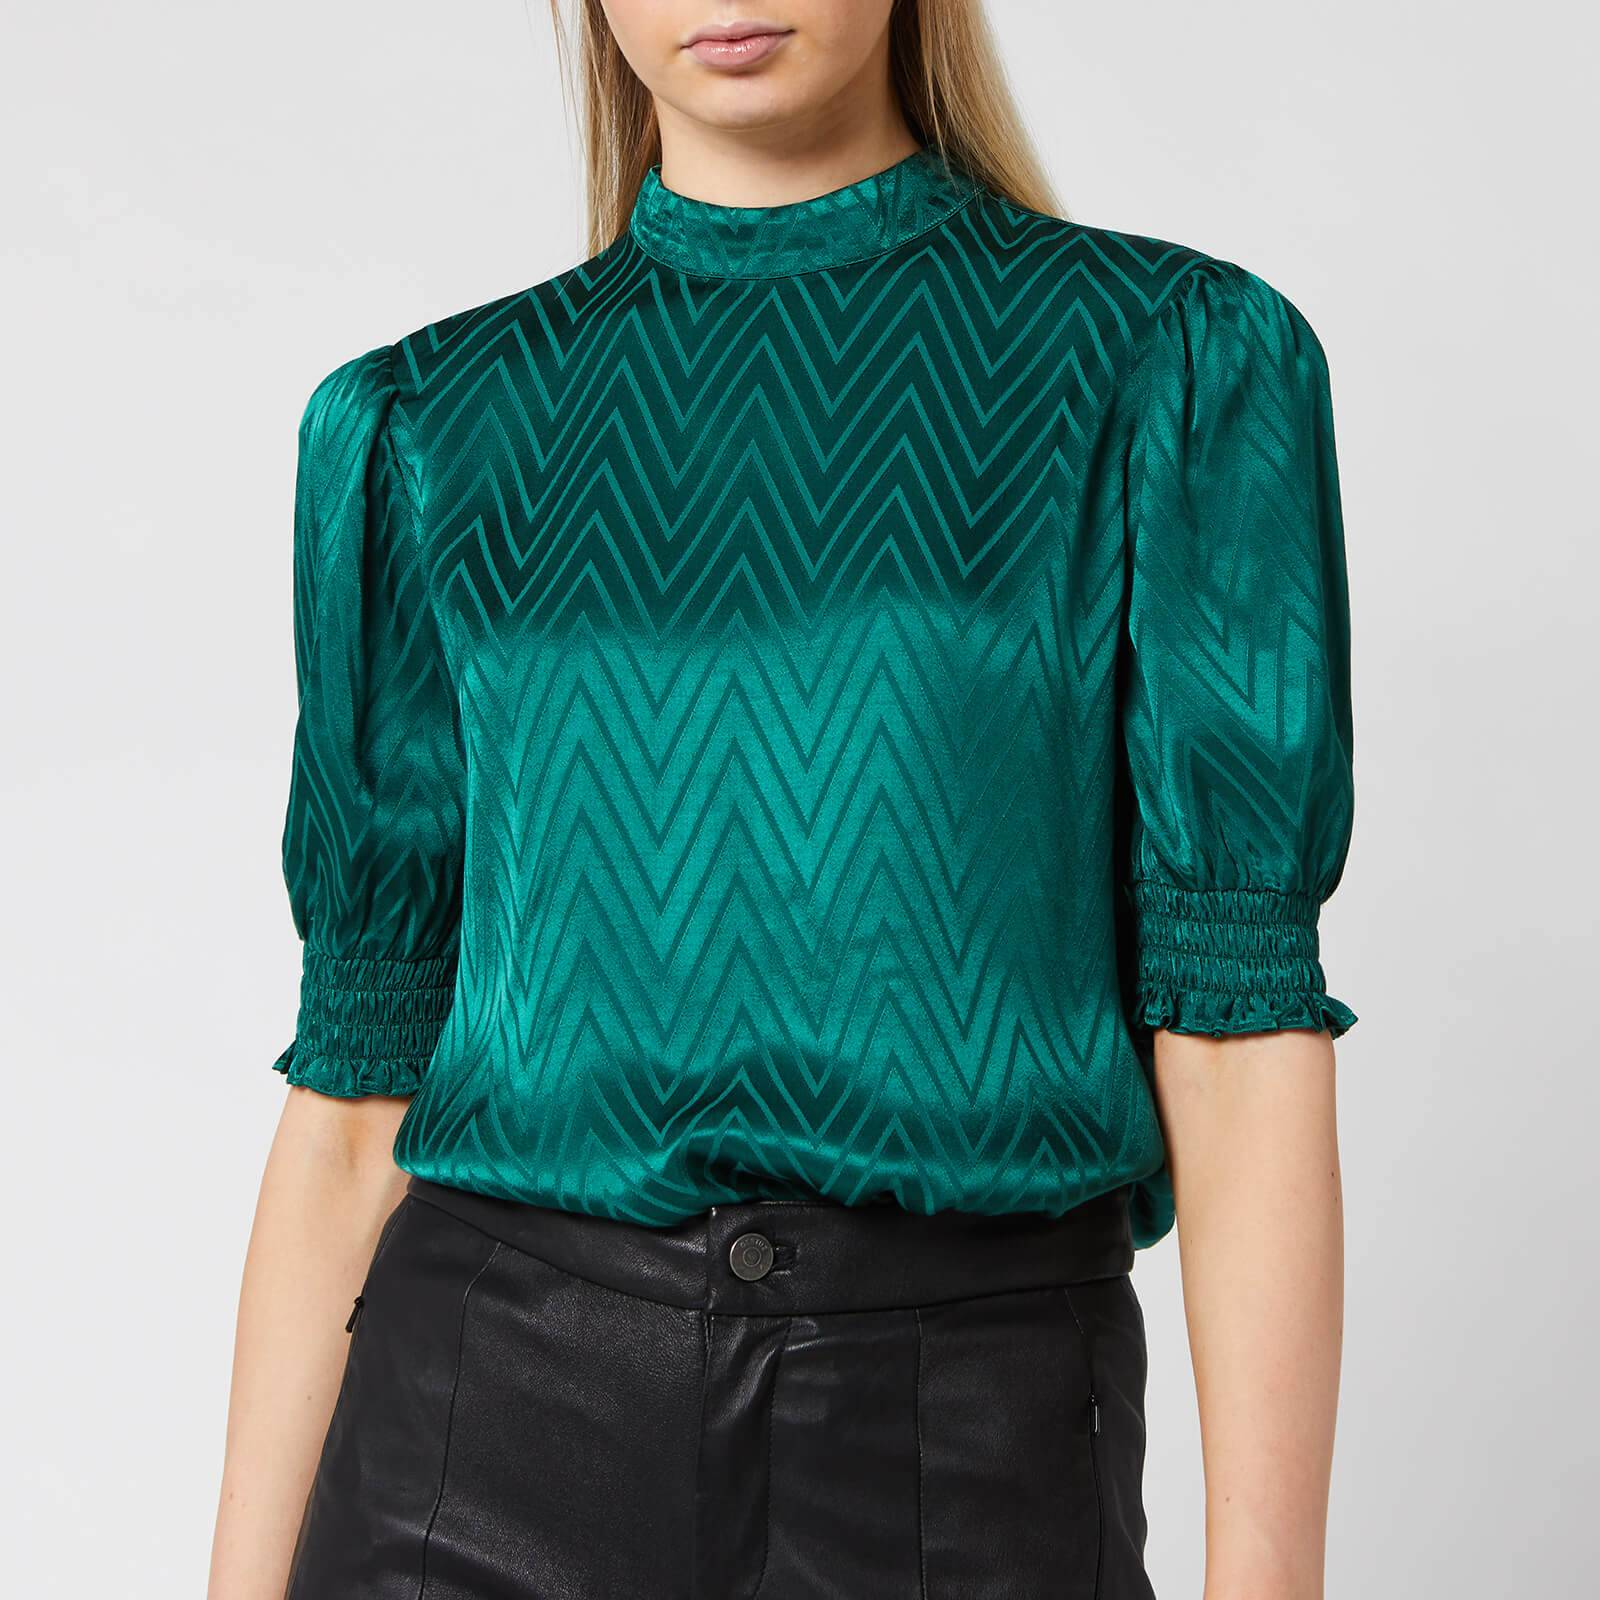 Ted Baker Women's Tiarie Bluson Puff Sleeve Top - Green - UK 10